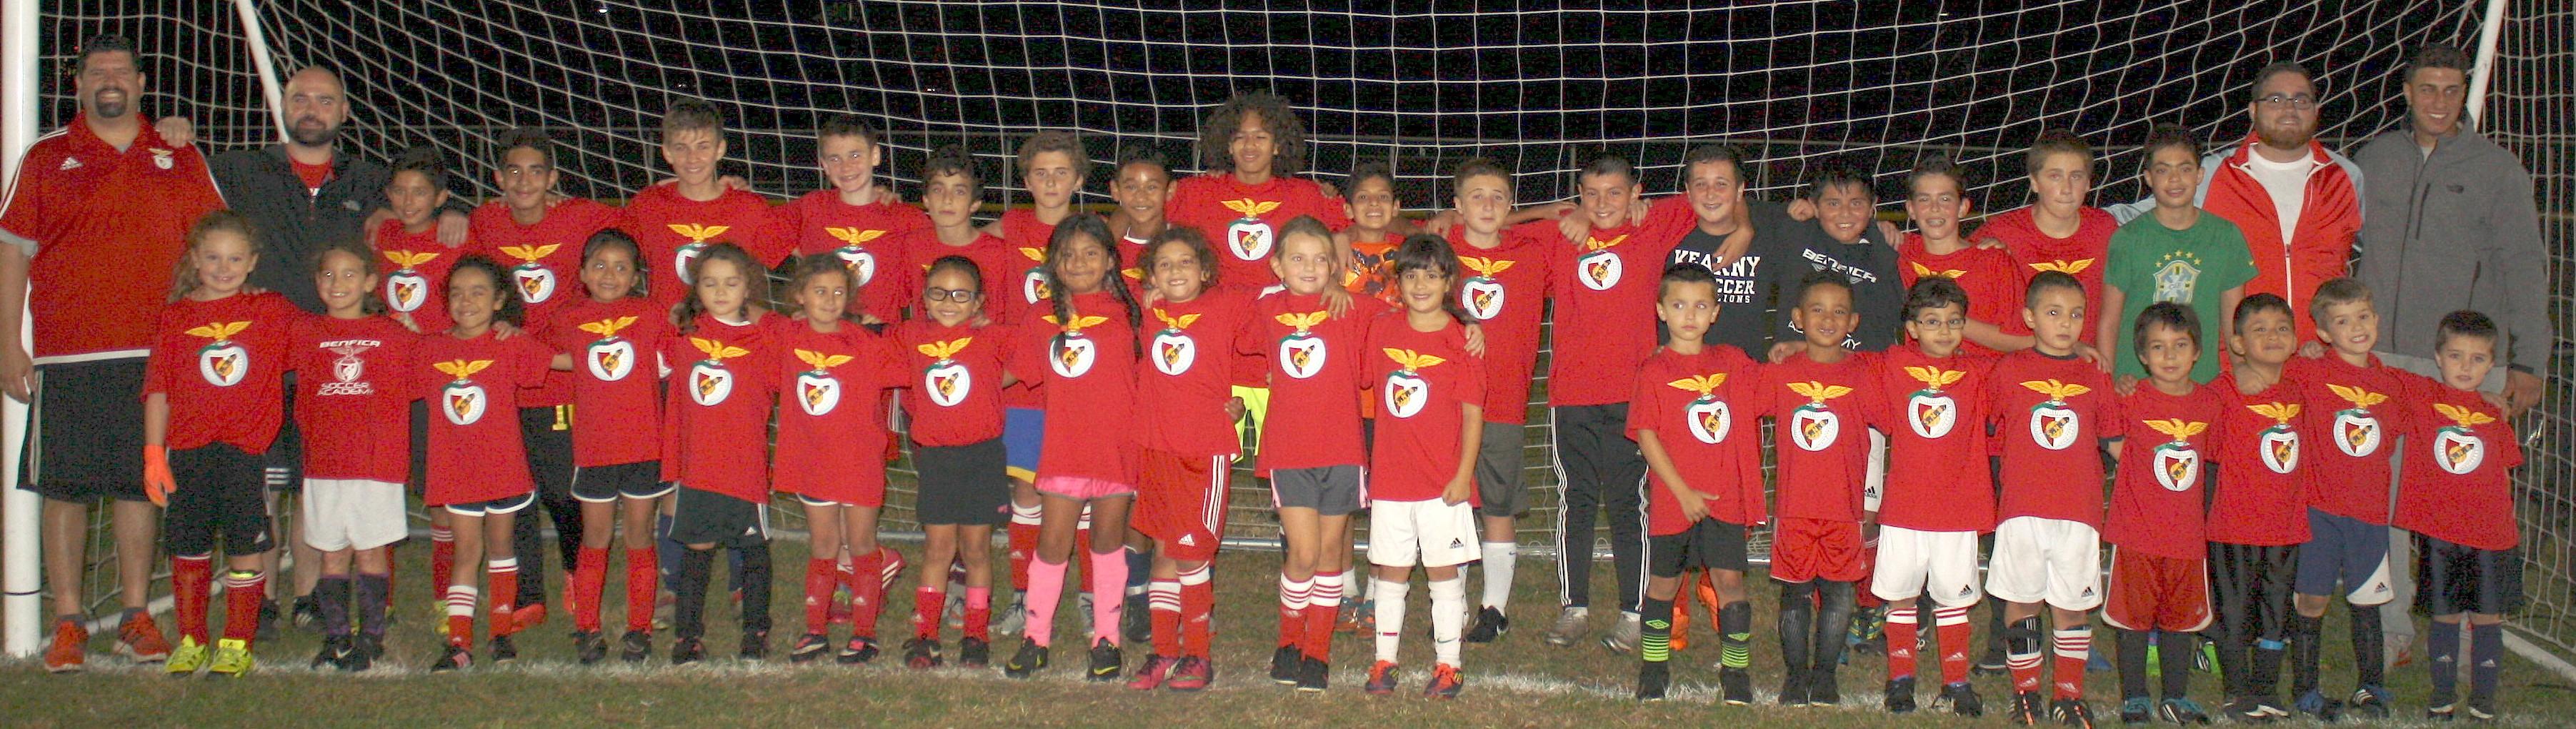 Benfica Soccer Academy